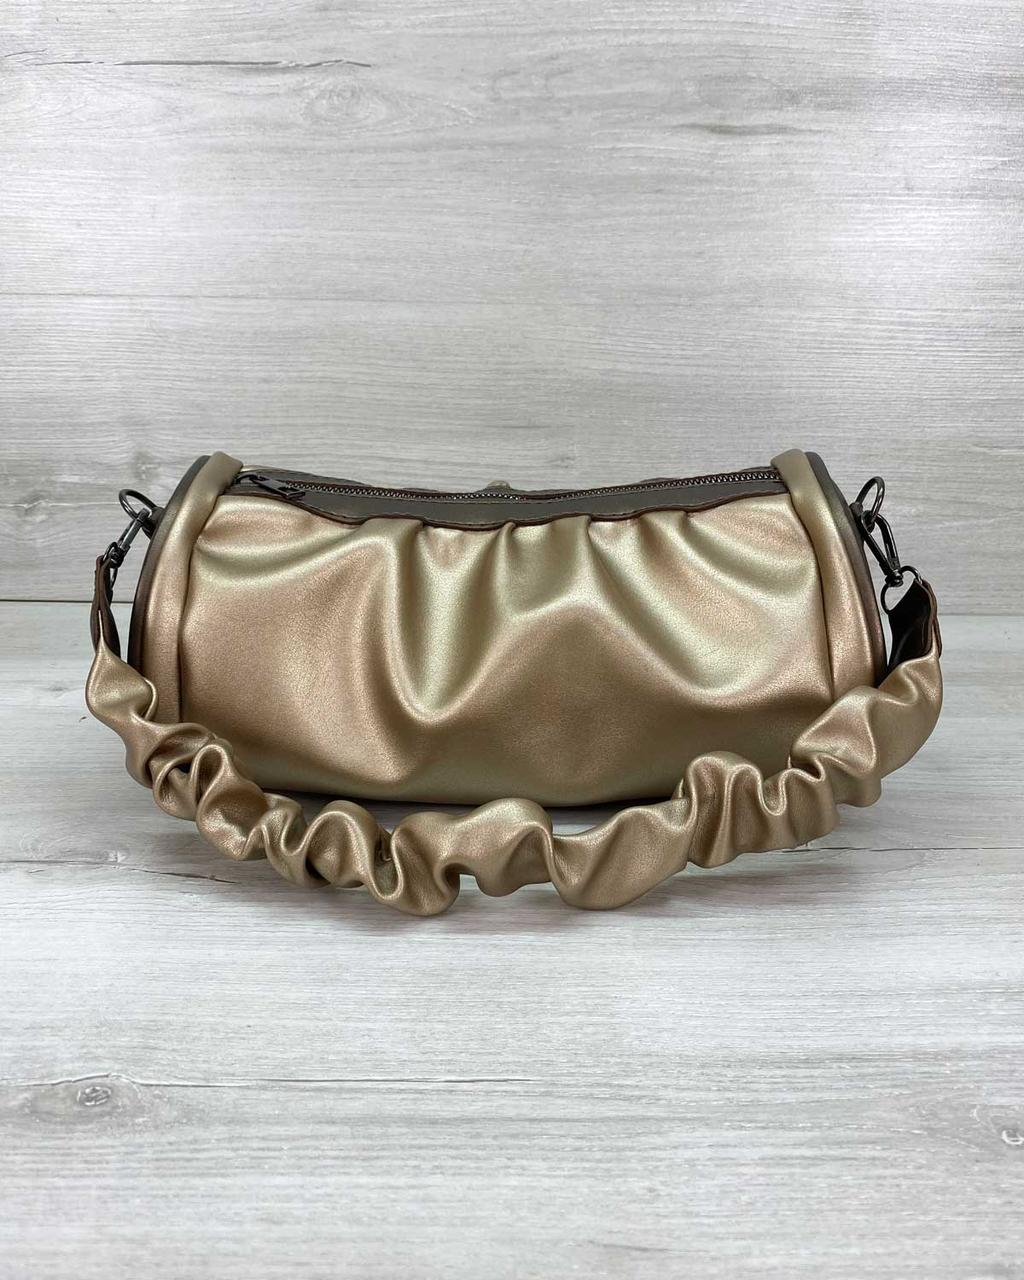 Маленька стильна жіноча сумочка золотиста